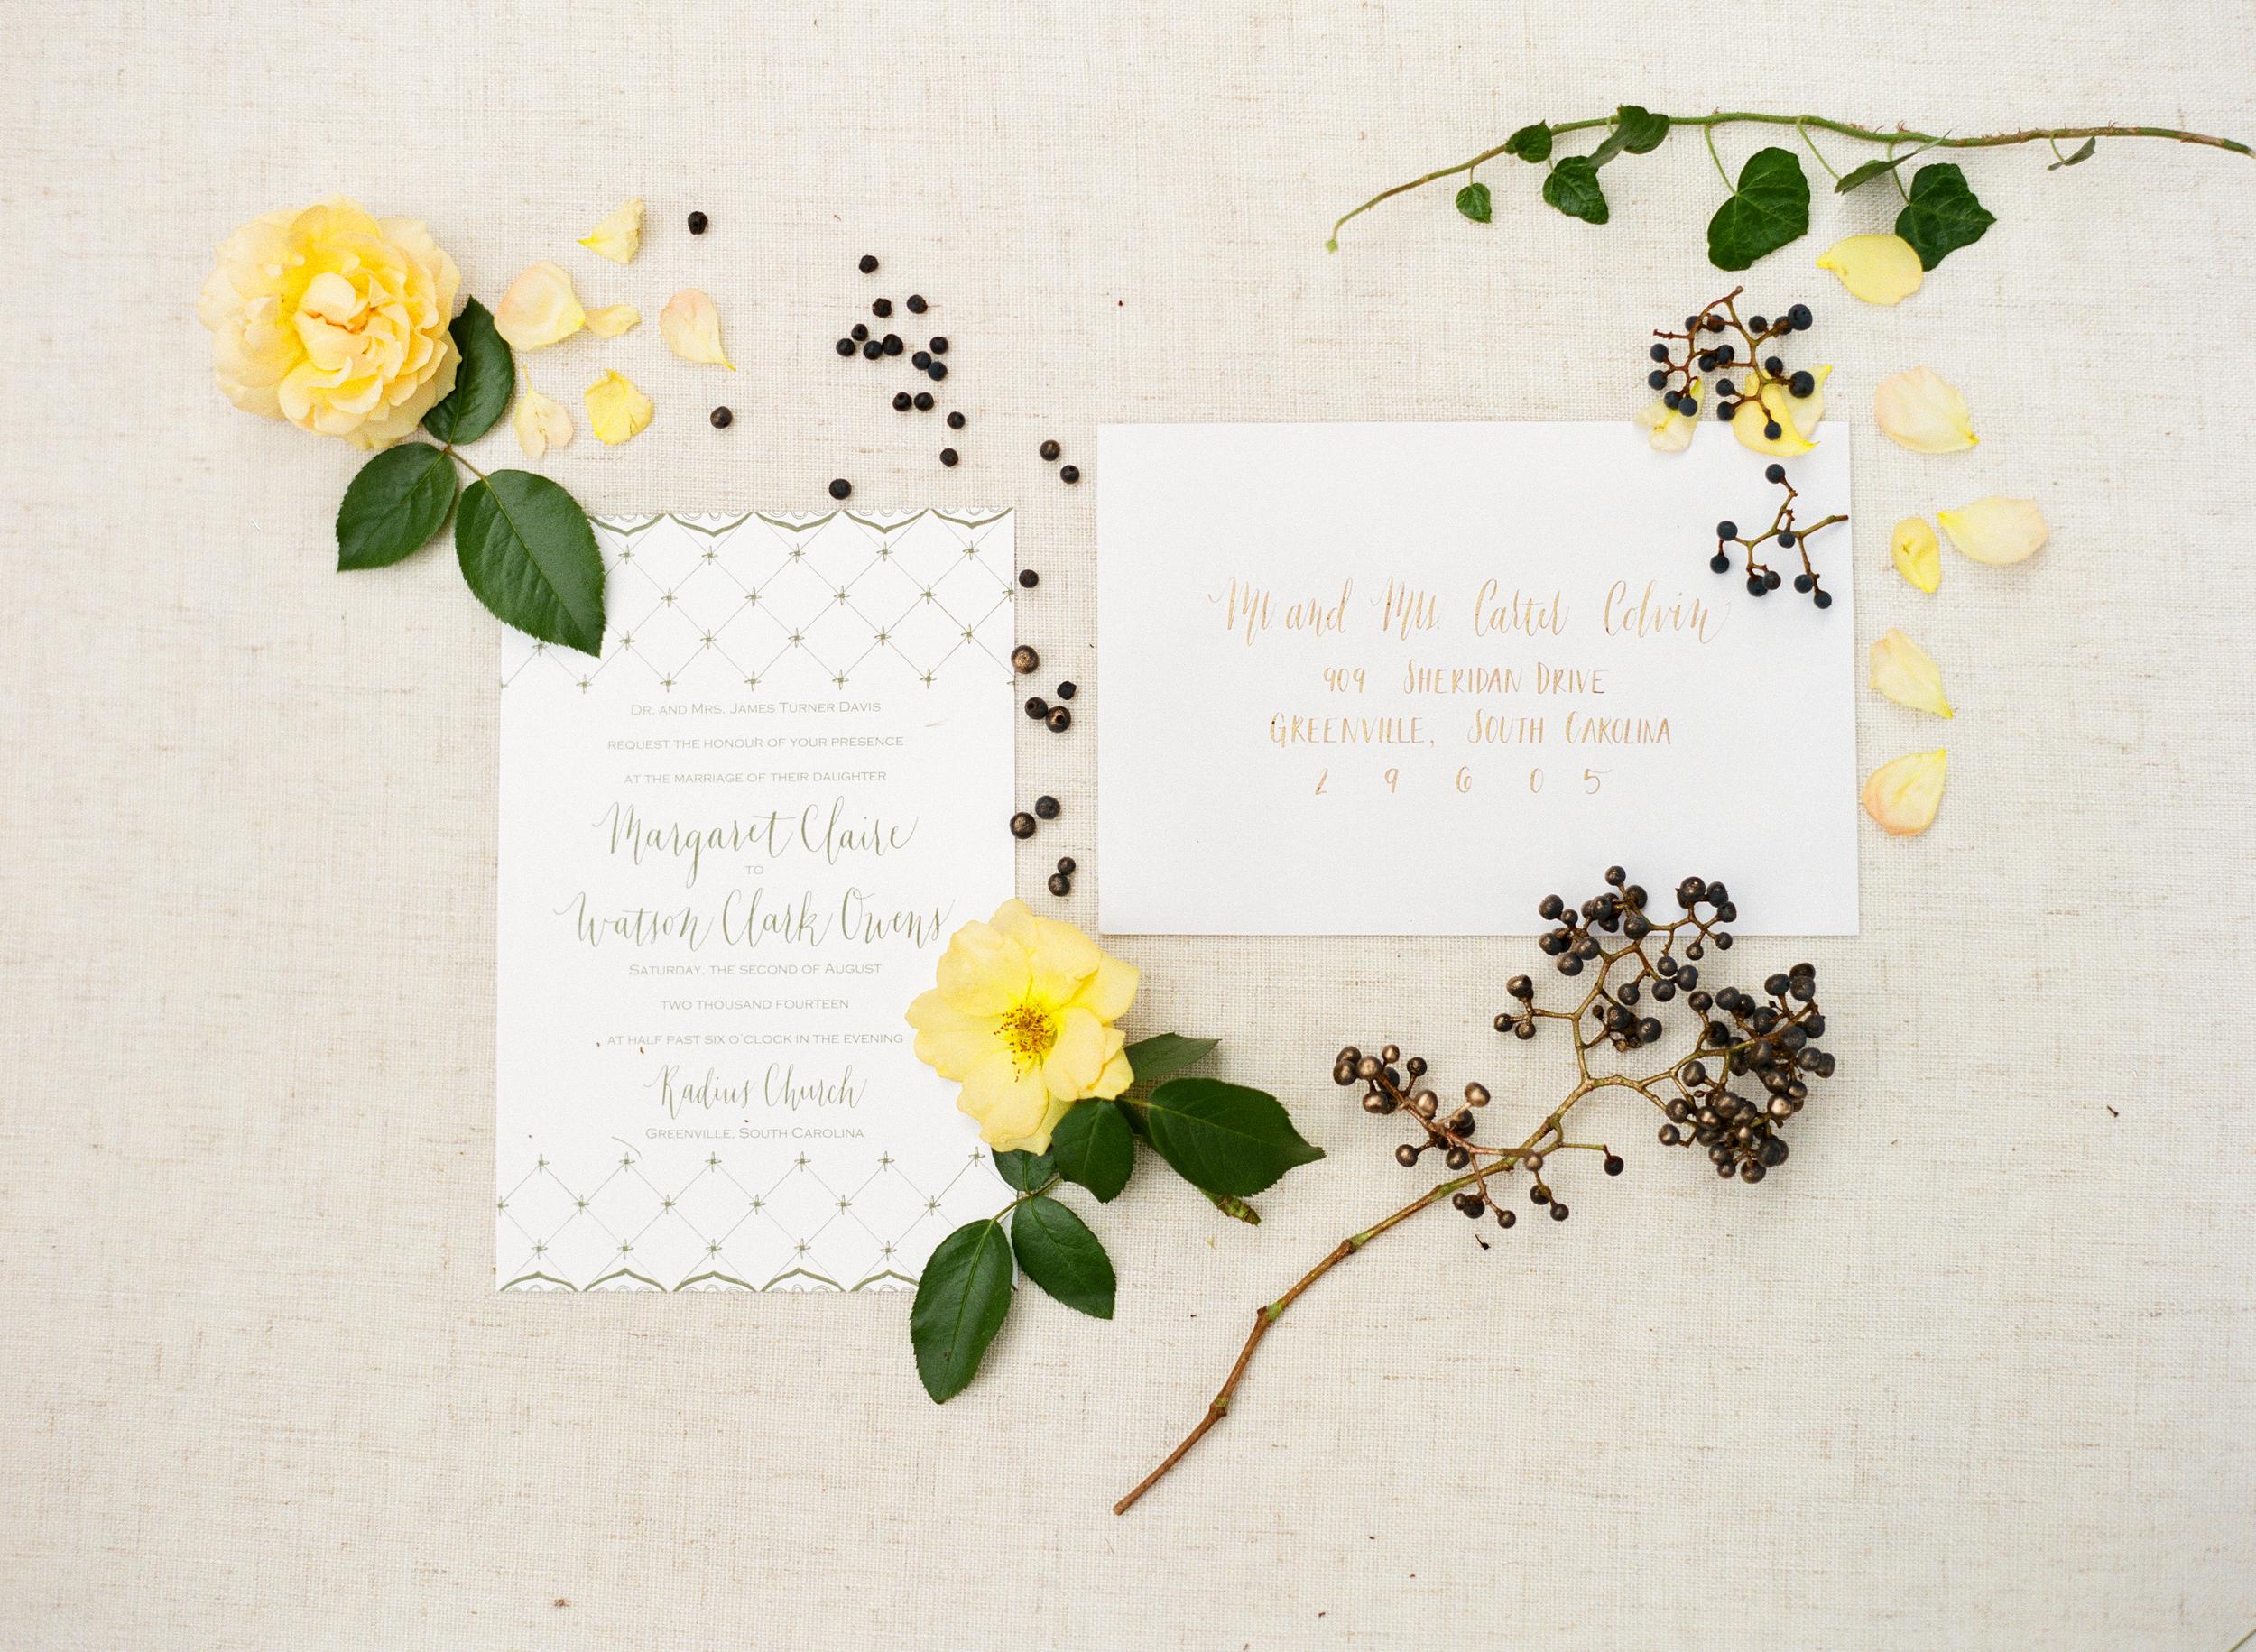 Olivia-Griffin-trendy-bride-magazine-willow-florals-sarah-seven-gwen-ivory-and-beau-bridal-boutique-savannah-wedding-dresses-savannah-bridal-boutique-savannah-wedding-savannah-bridal-gowns-savannah-wedding-planner-georgia-bridal-boutique-1.JPG